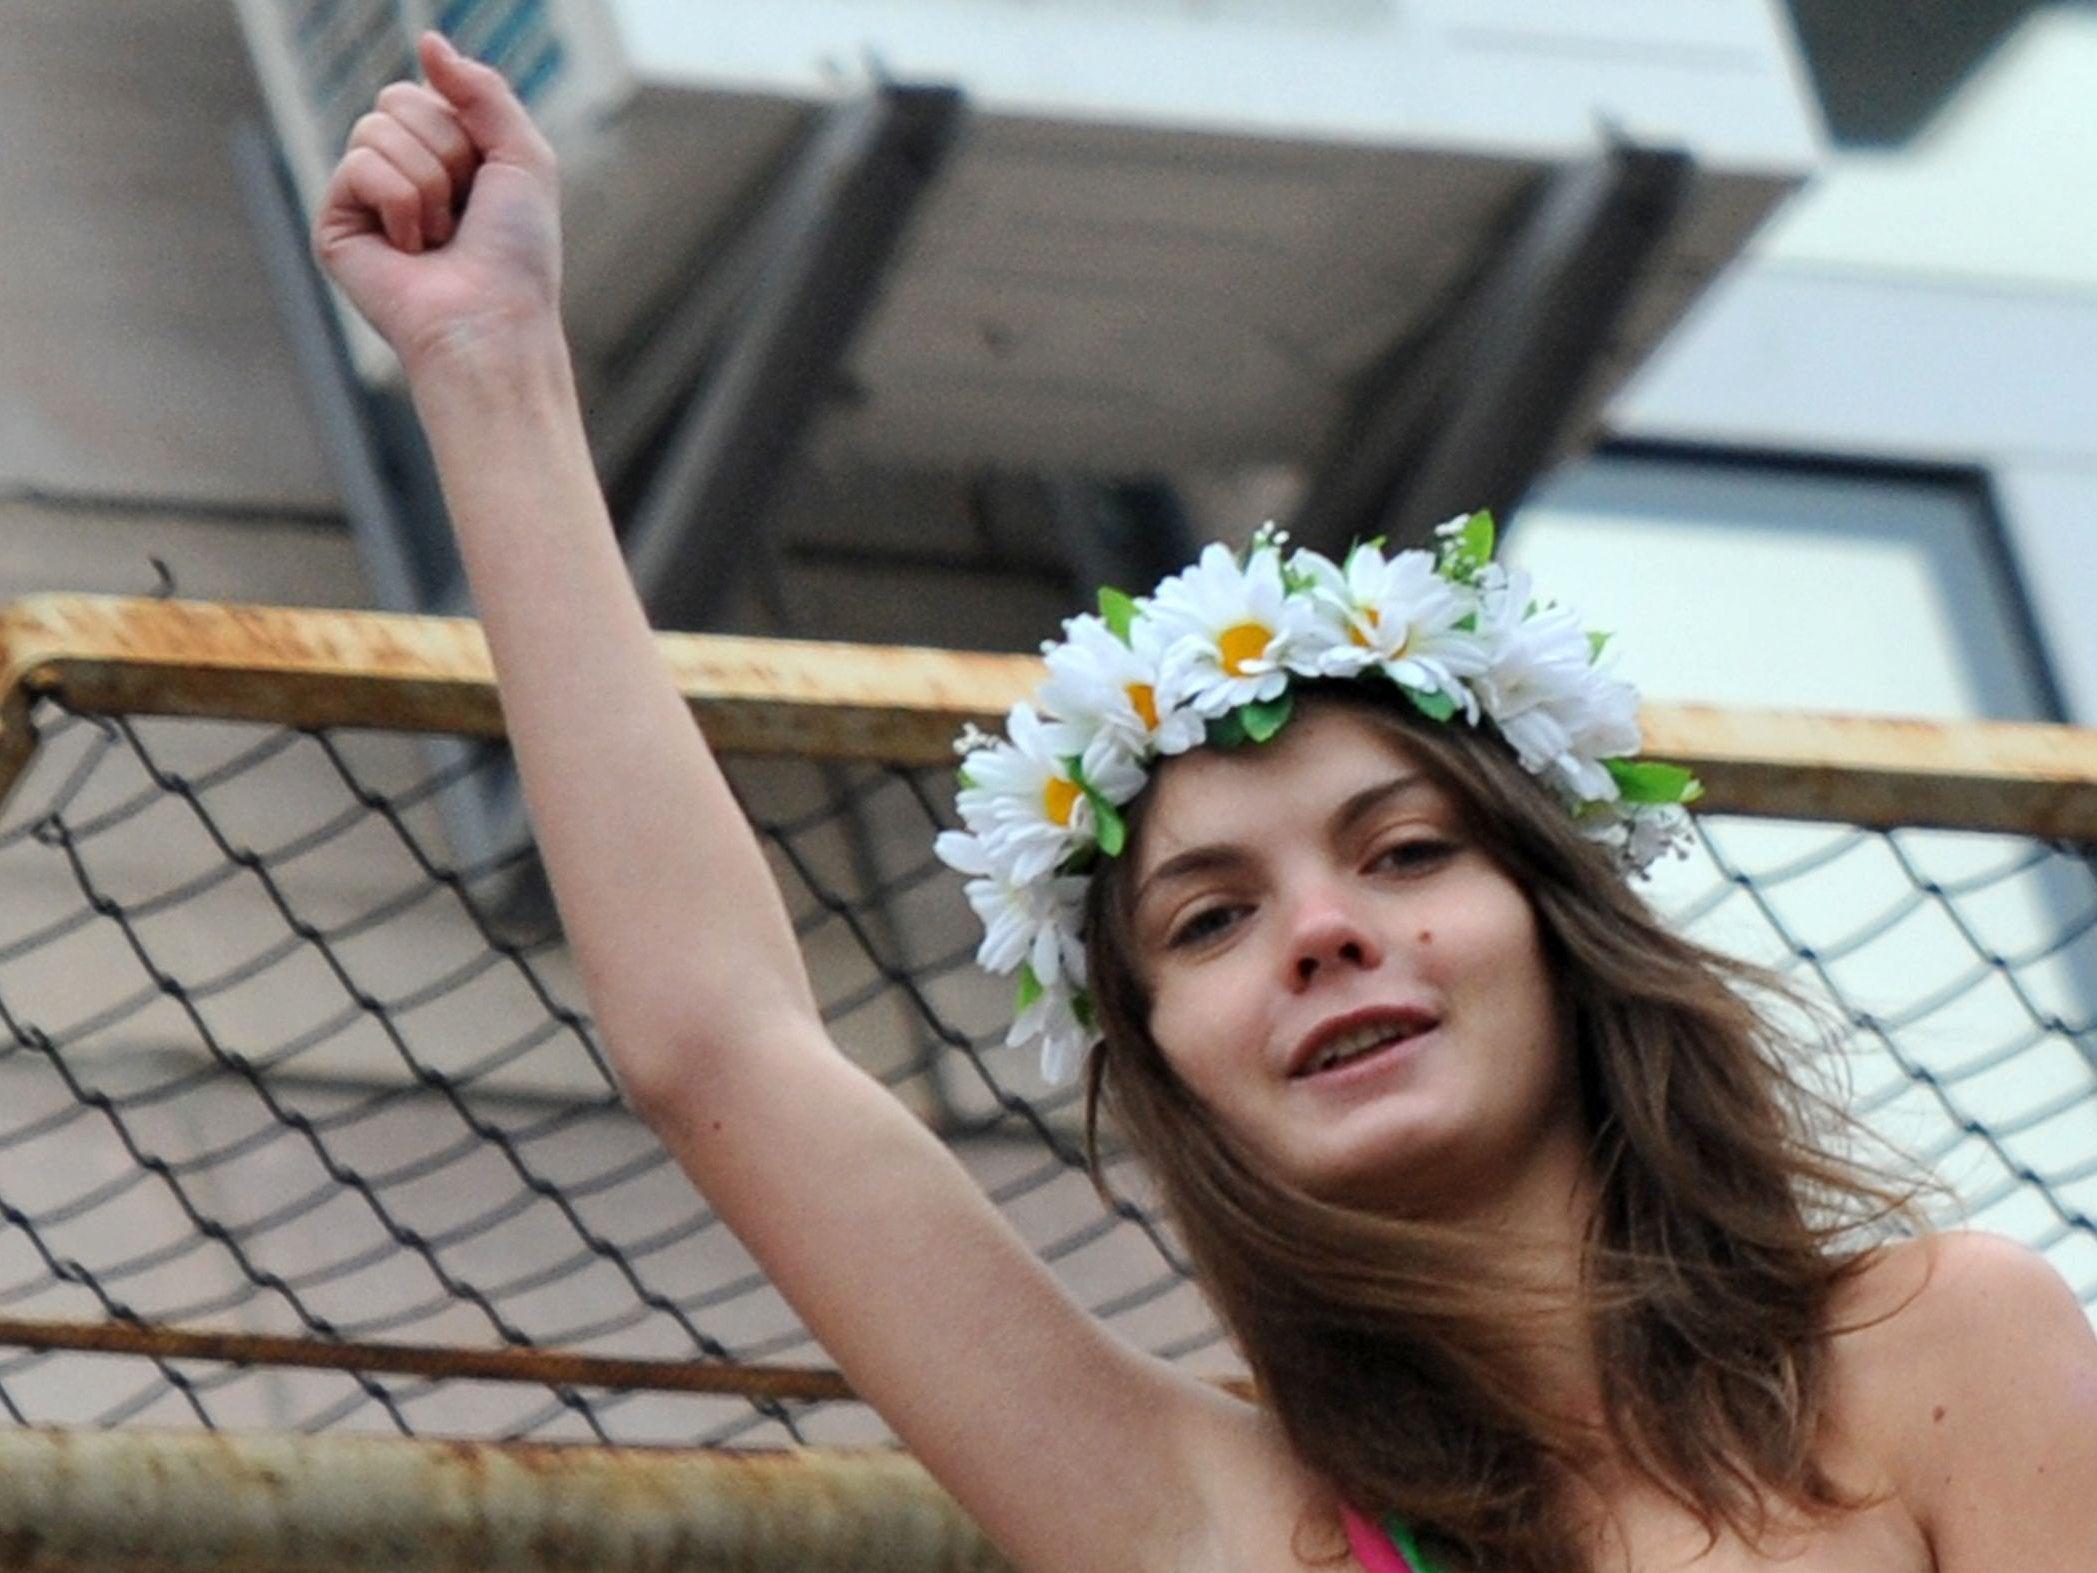 Oksana Shachko death: Femen founder's body discovered in Paris apartment